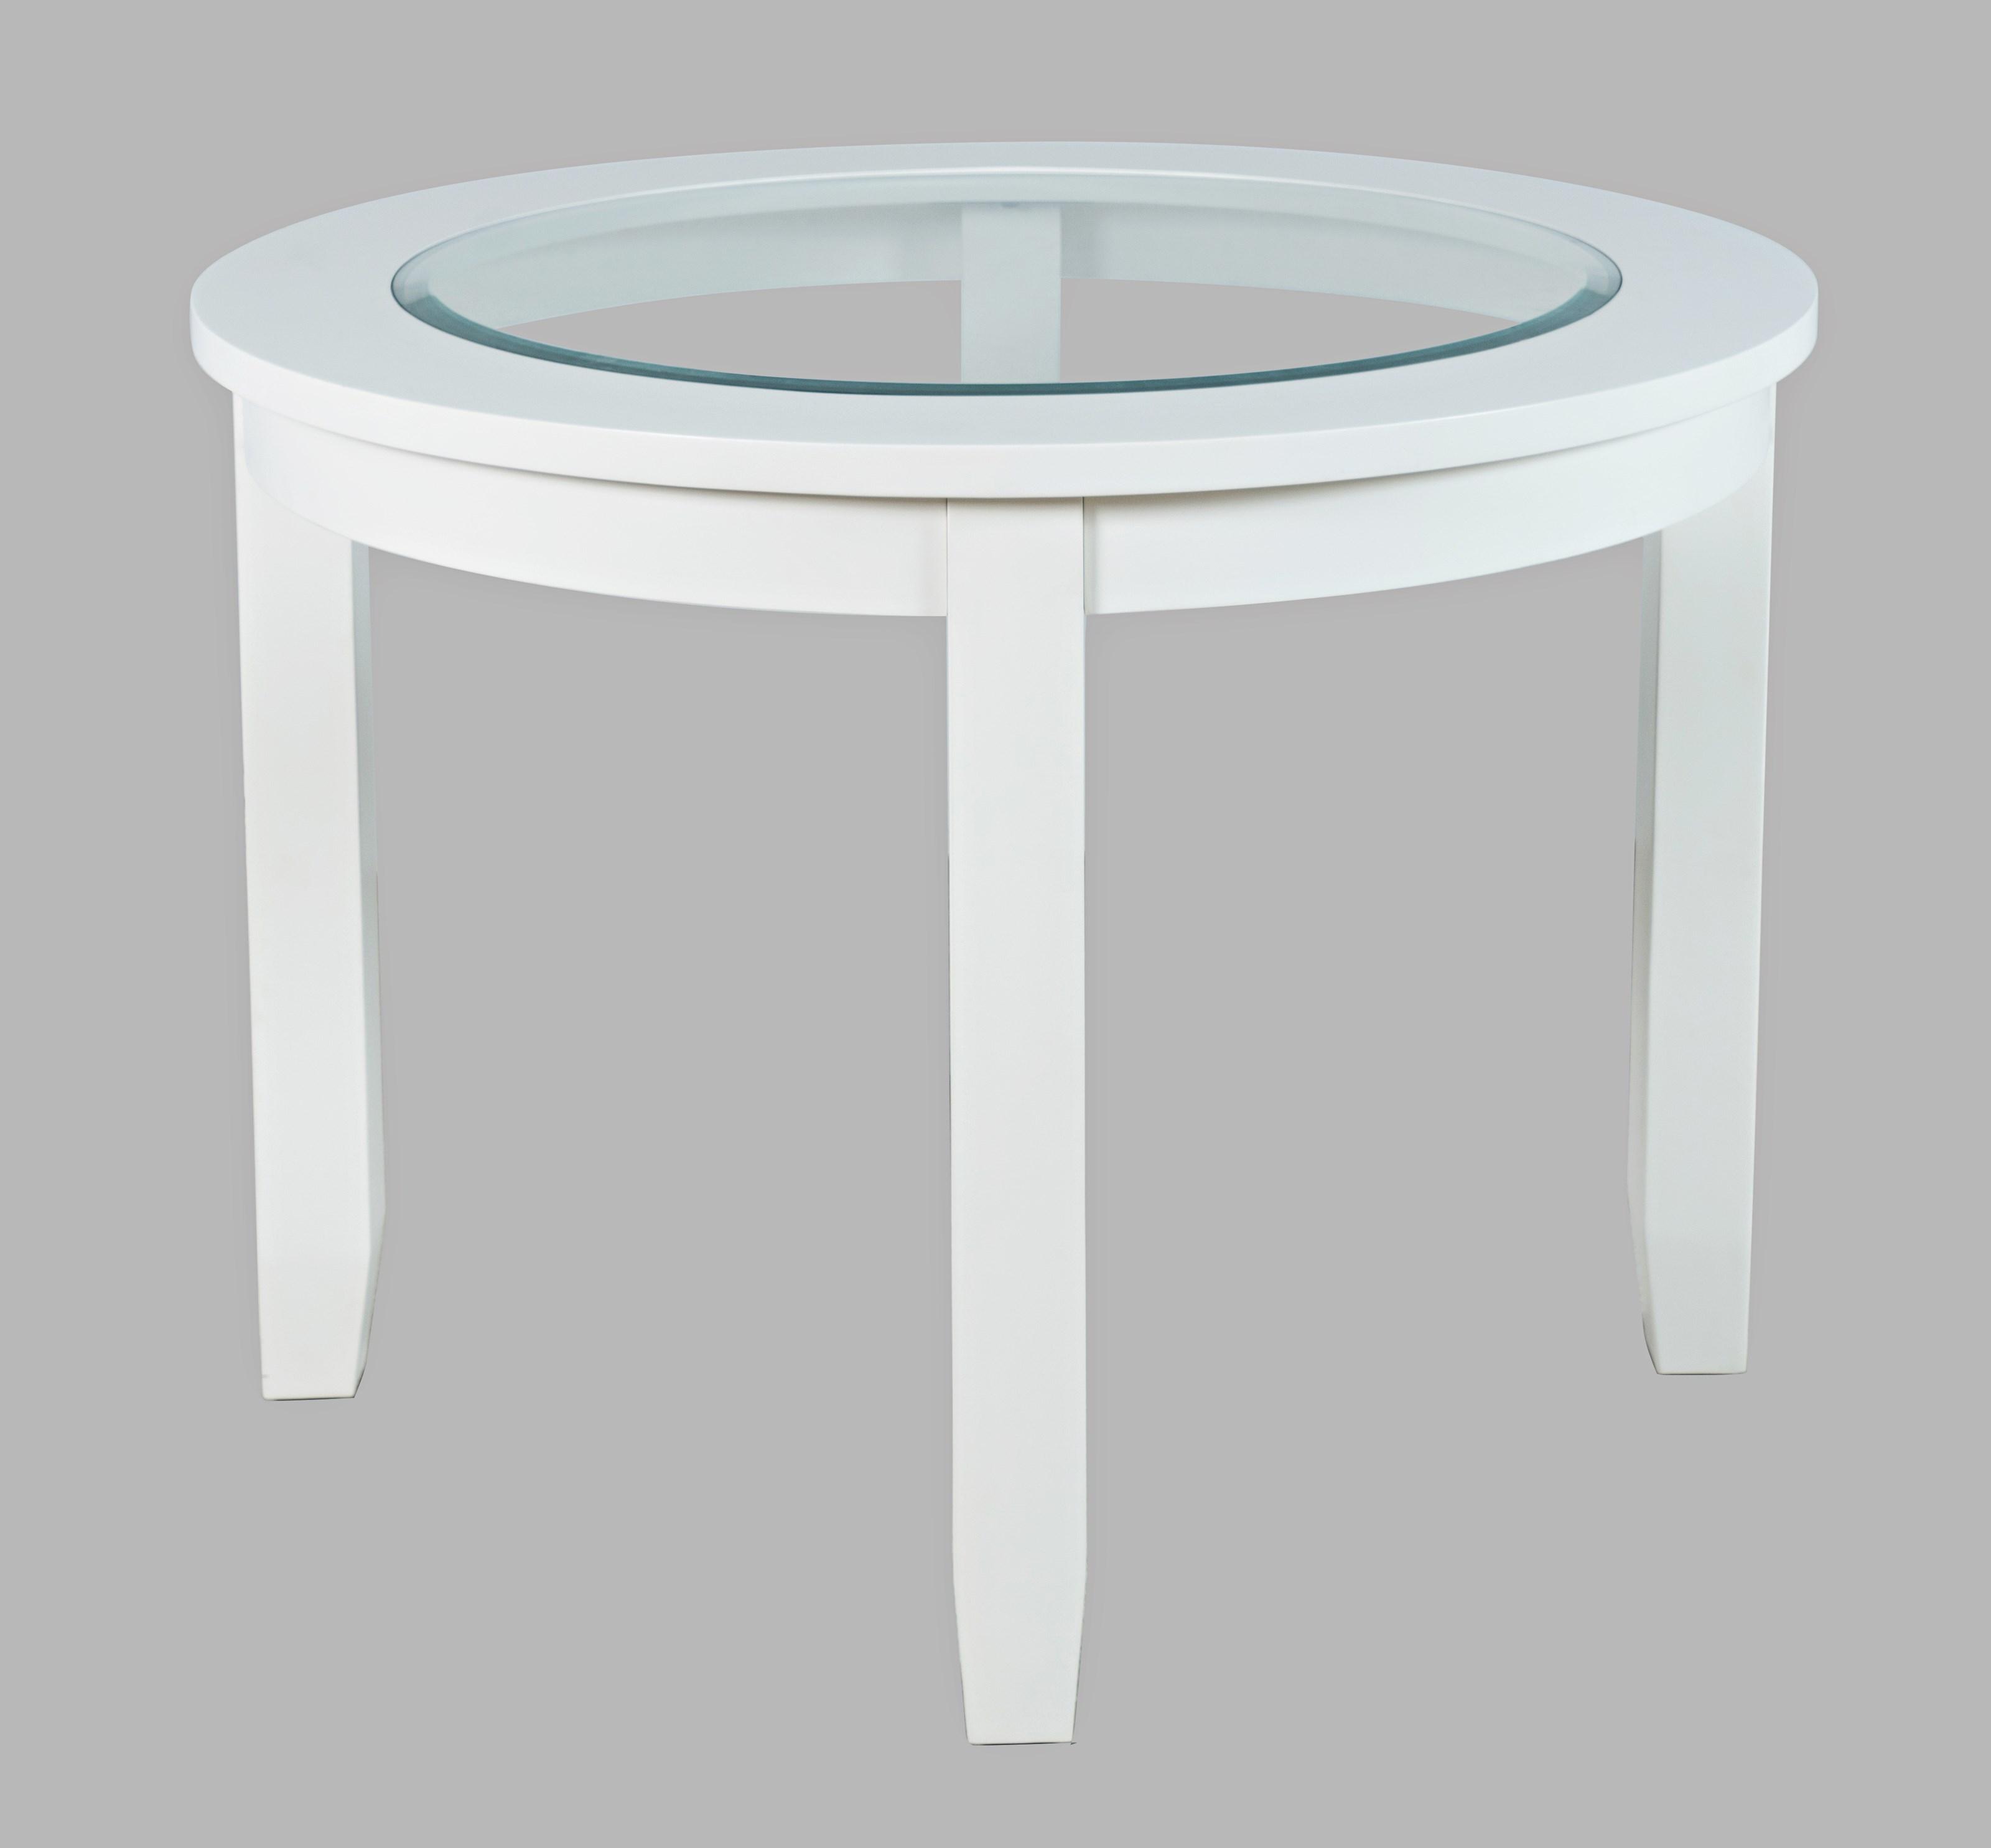 "Urban Icon 42"" Round Dining Table by Jofran at Jofran"